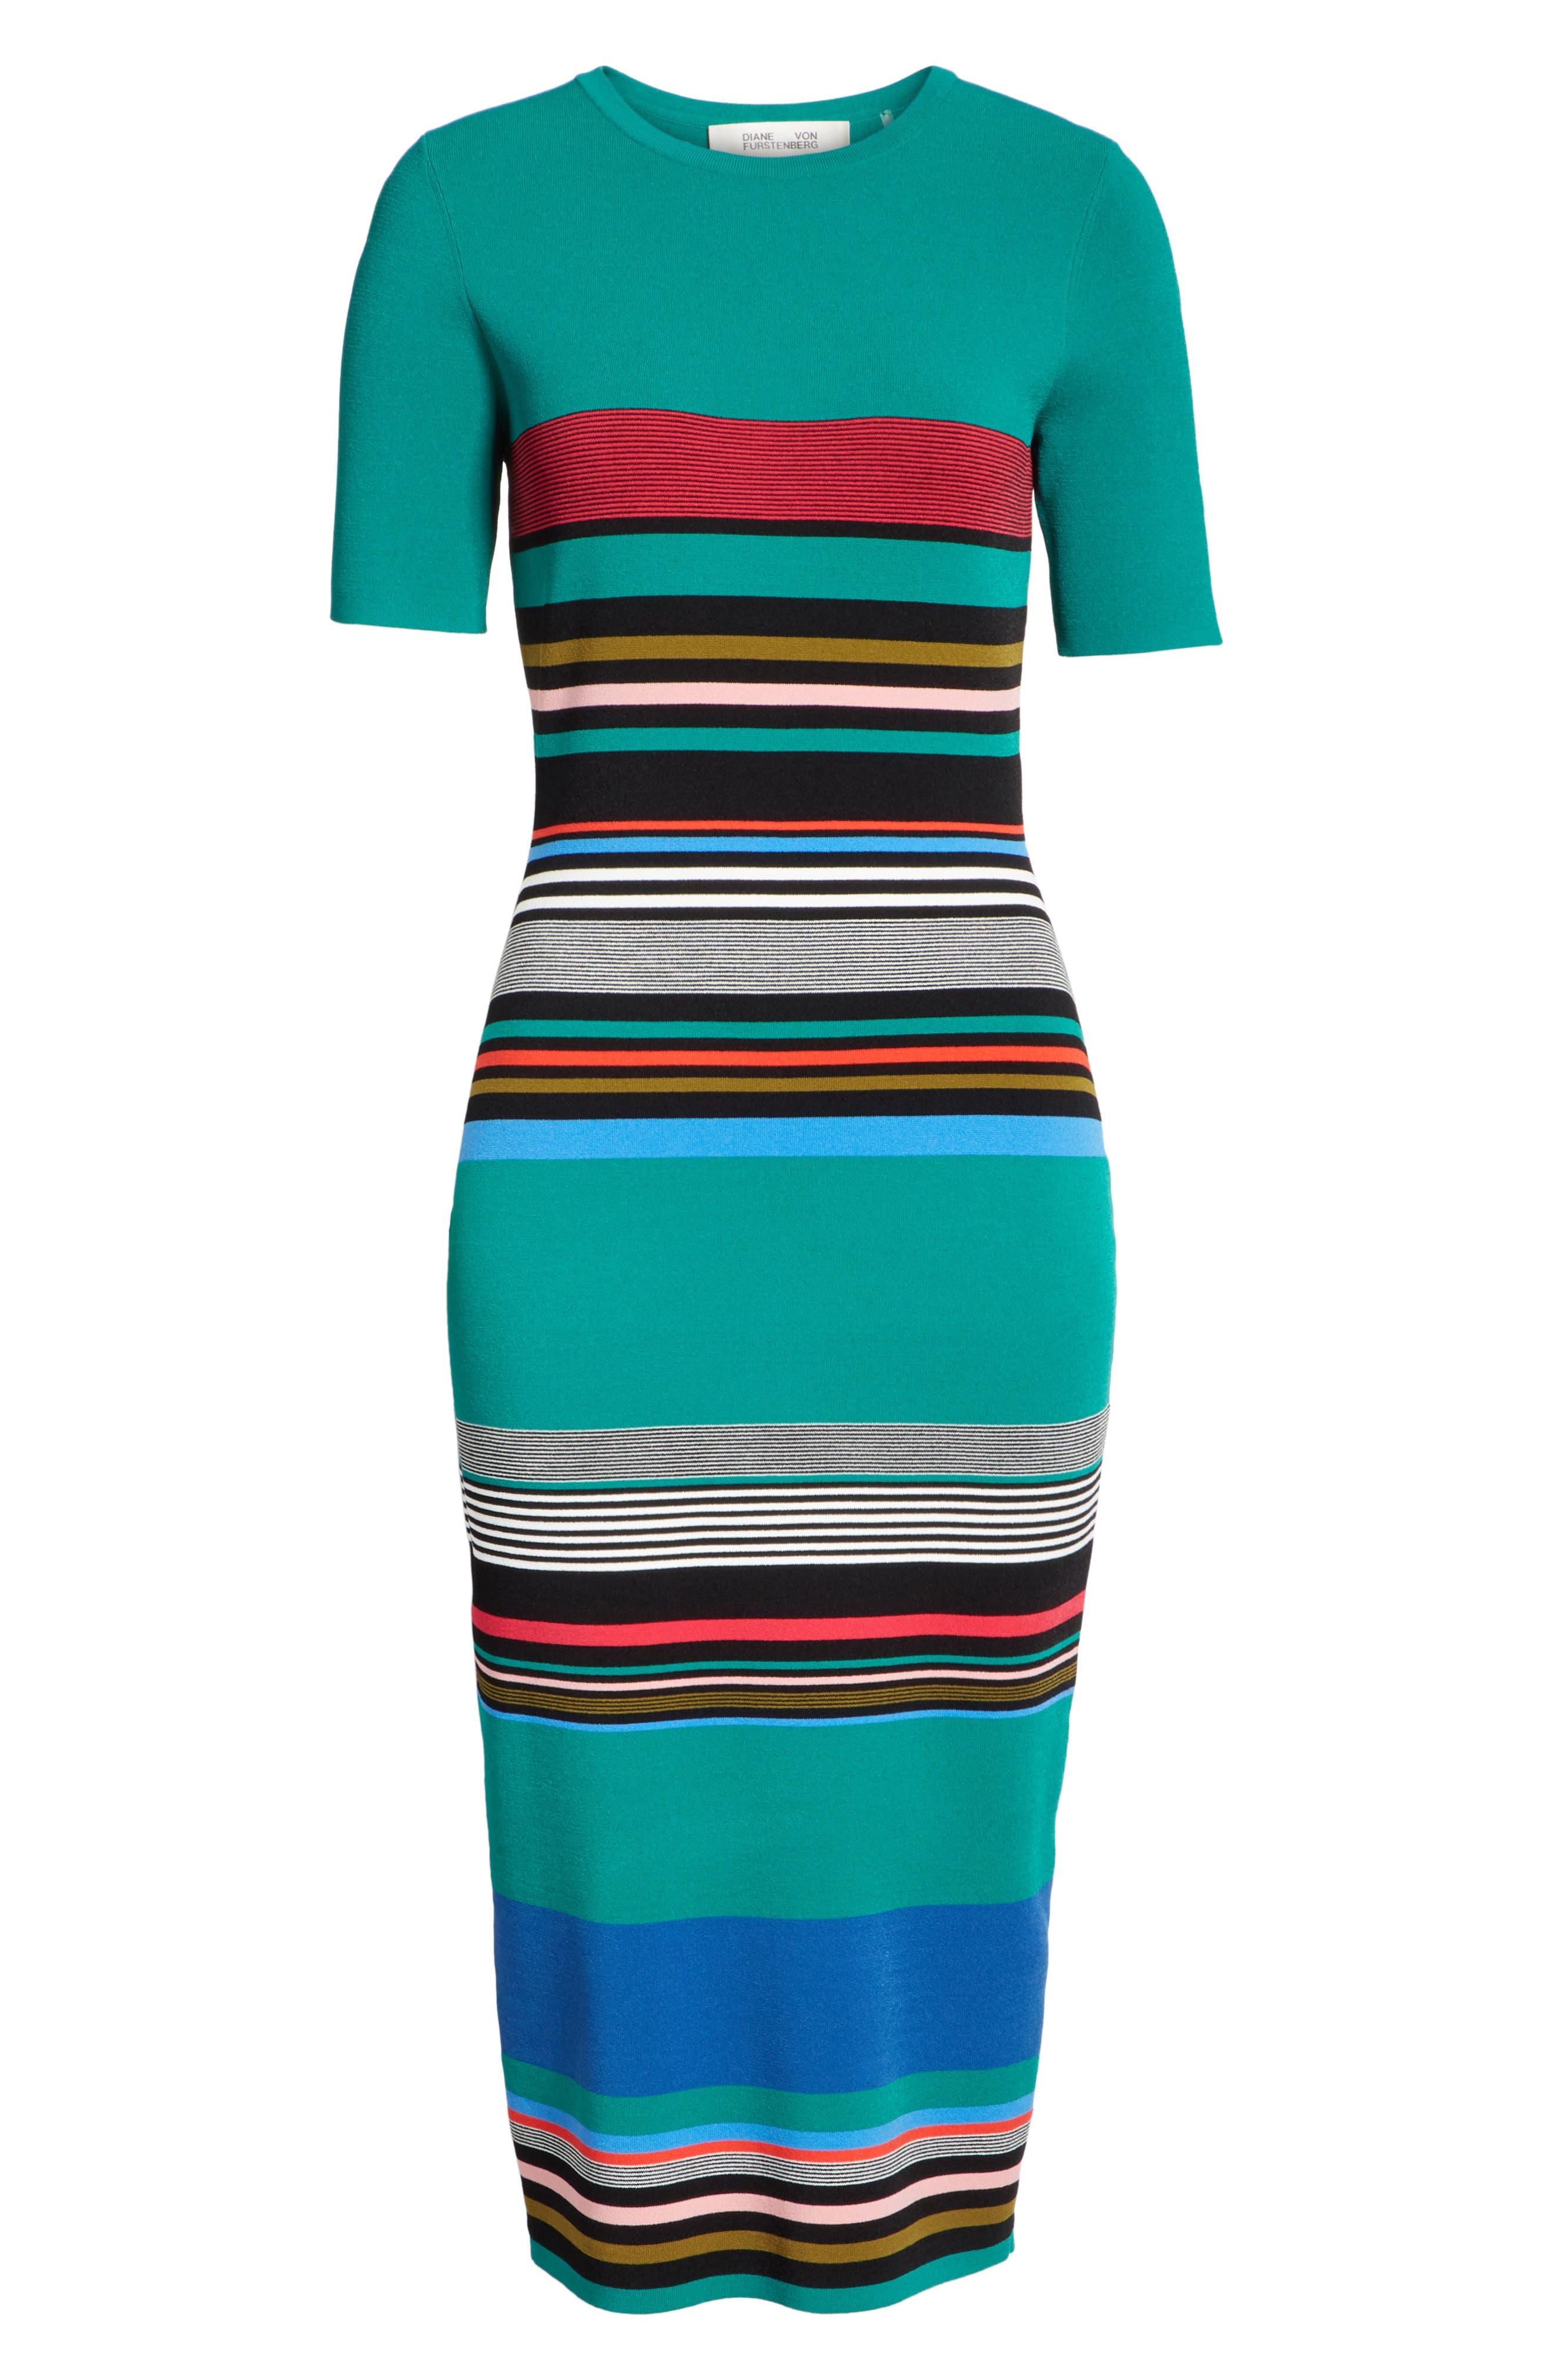 Diane von Furstenberg Stripe Short Sleeve Sweater Dress,                             Alternate thumbnail 6, color,                             386